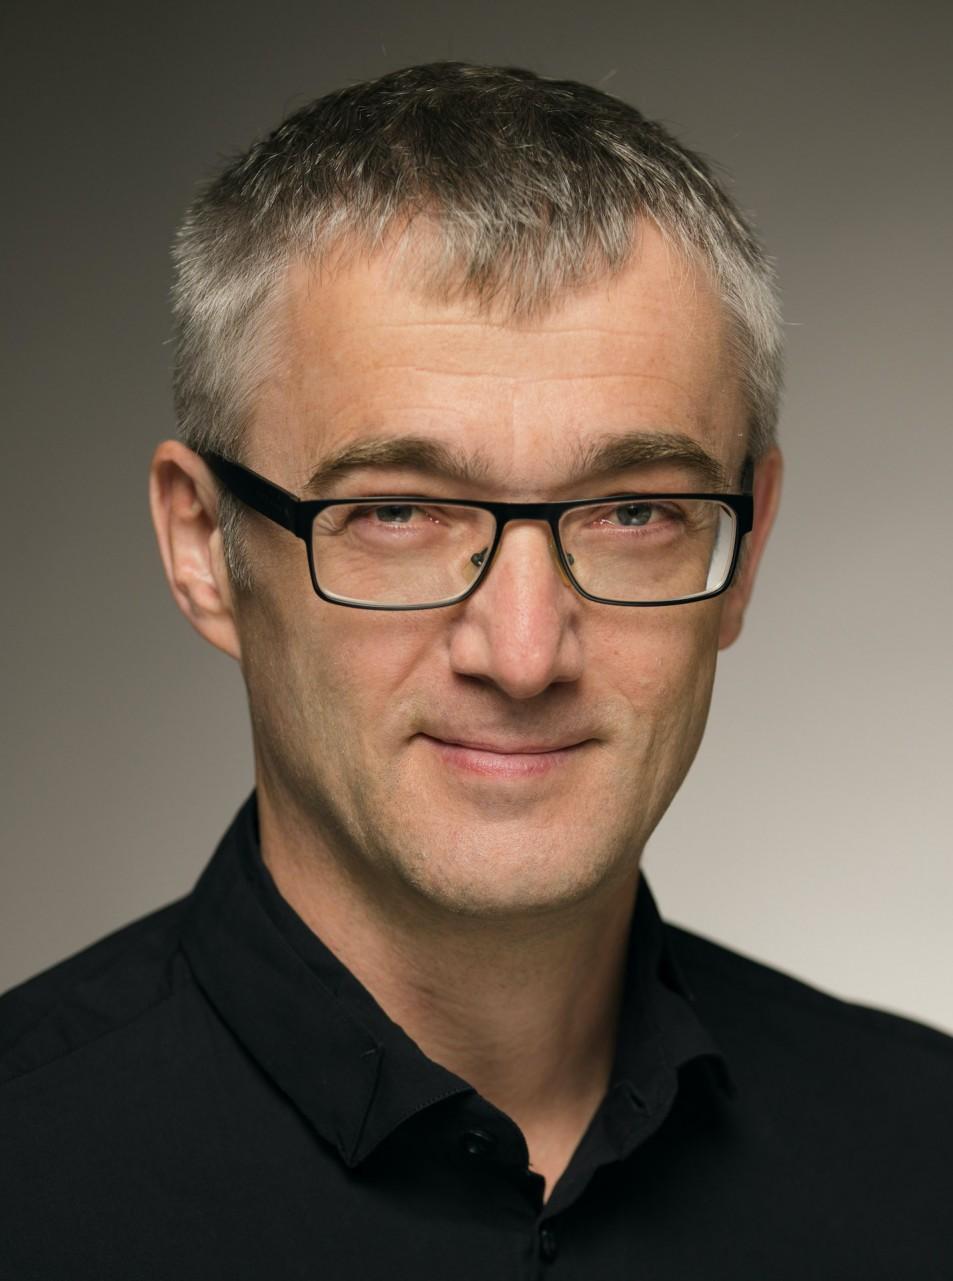 Jürgen Oberschmidt